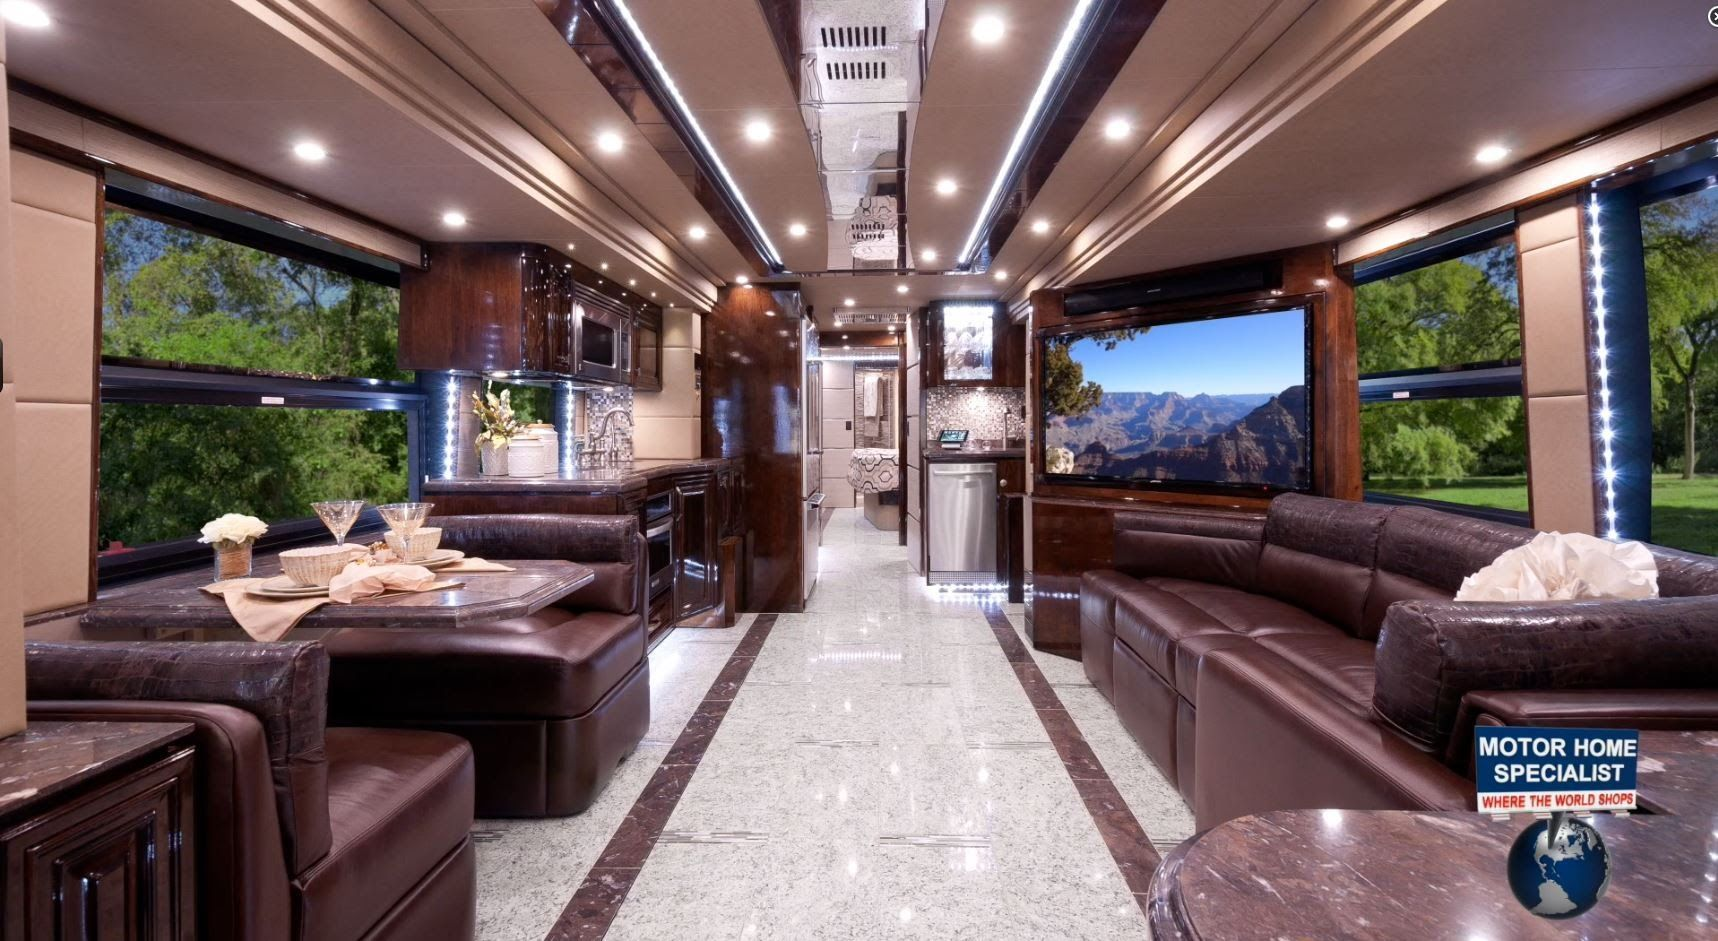 2 2 Million Outlaw Luxury Prevost Rv At Mhsrv Com Quot The